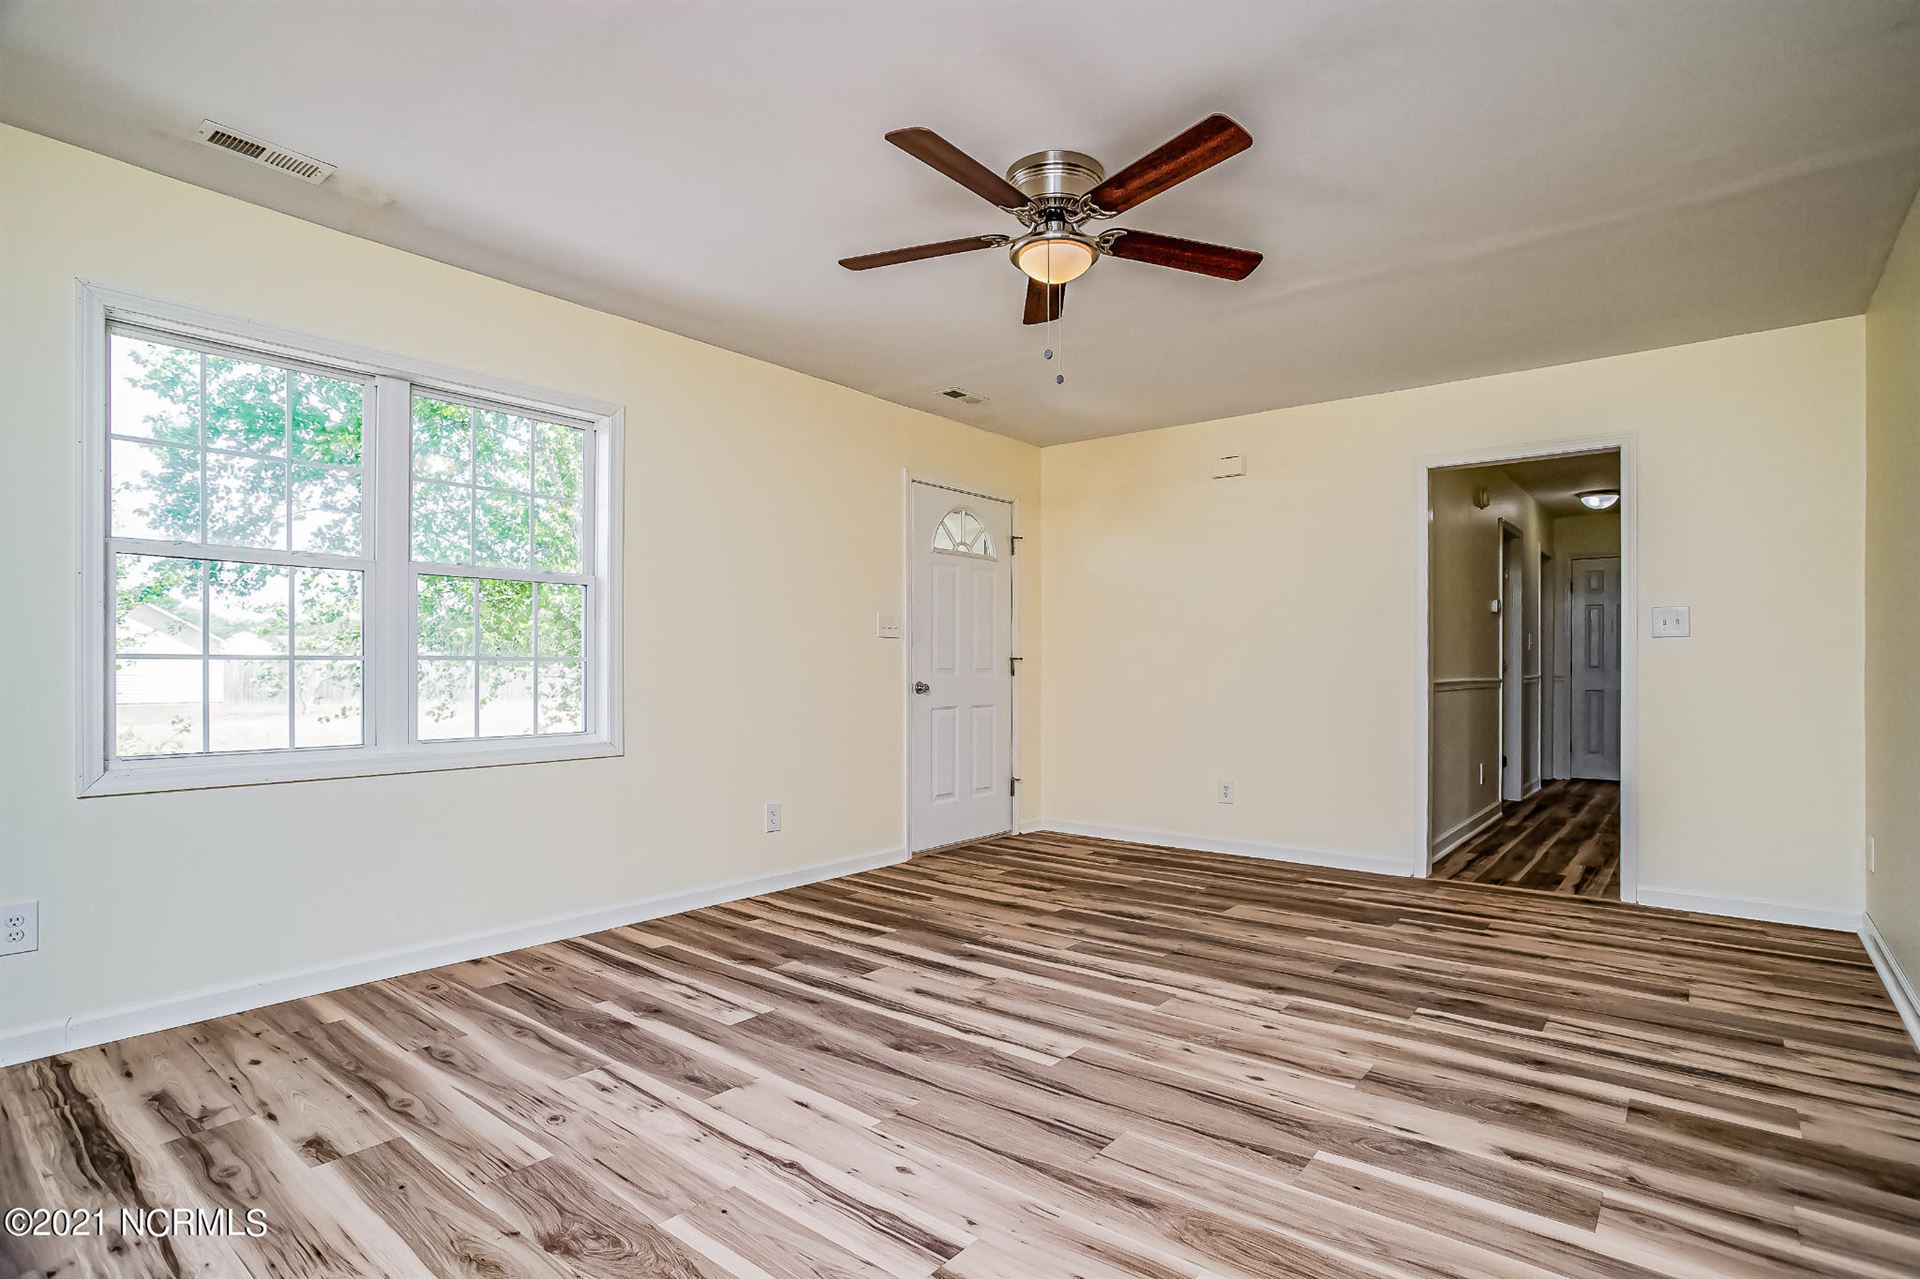 Photo of 600 Bridle Court, Swansboro, NC 28584 (MLS # 100280380)